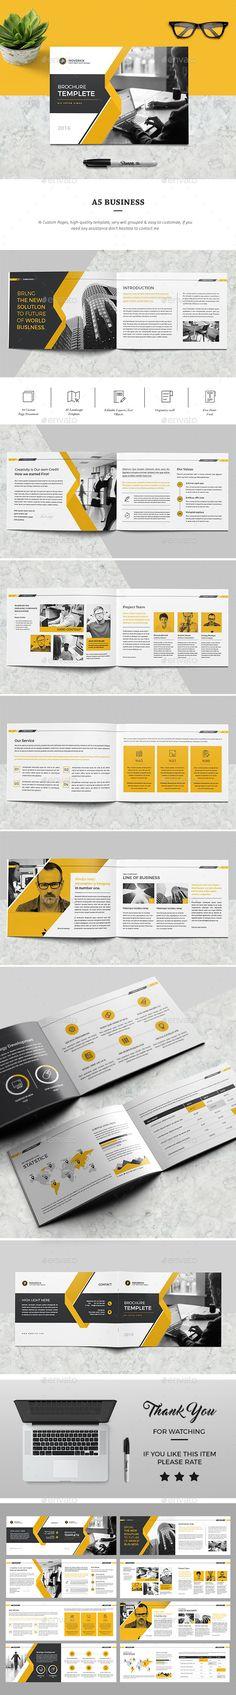 Brochure — InDesign INDD #business #brief • Download ➝ https://graphicriver.net/item/brochure/19499537?ref=pxcr